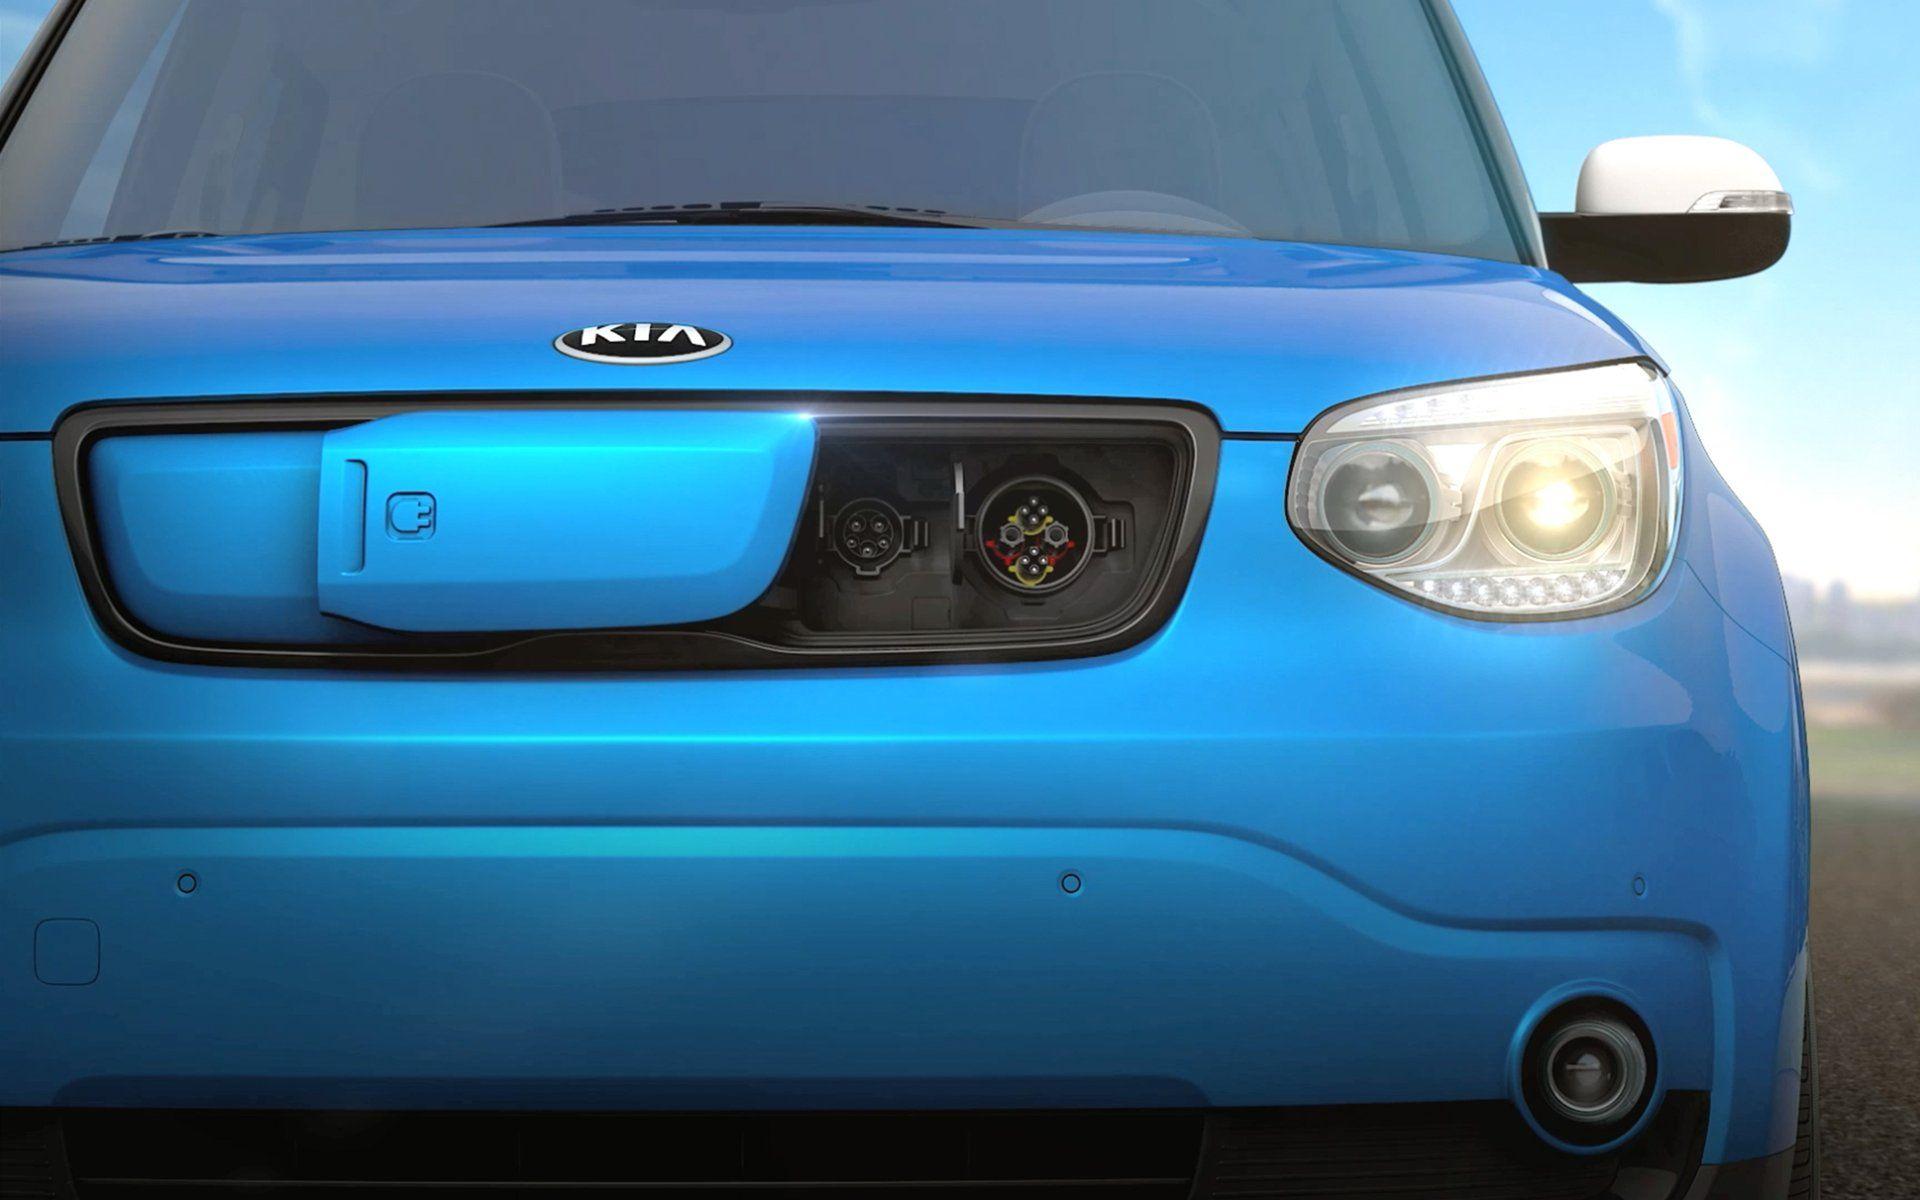 news soul kia profile introduces aub hendy blue latest urban